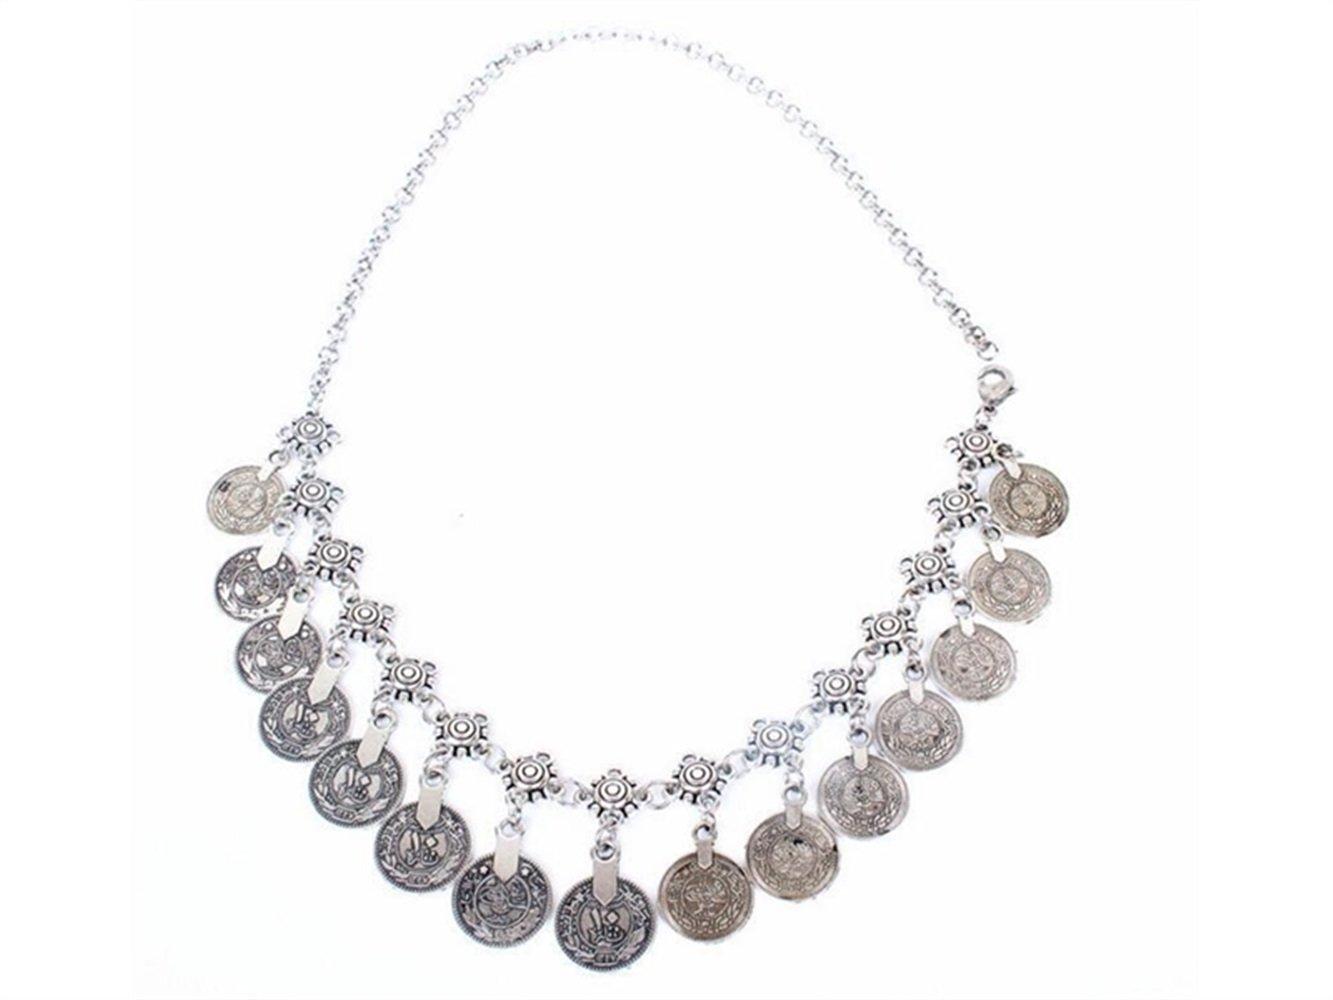 HGJNGHBNG Well 1PC Retro Coin Tassel Headdress bohemian ancient coin head chain(Sliver)